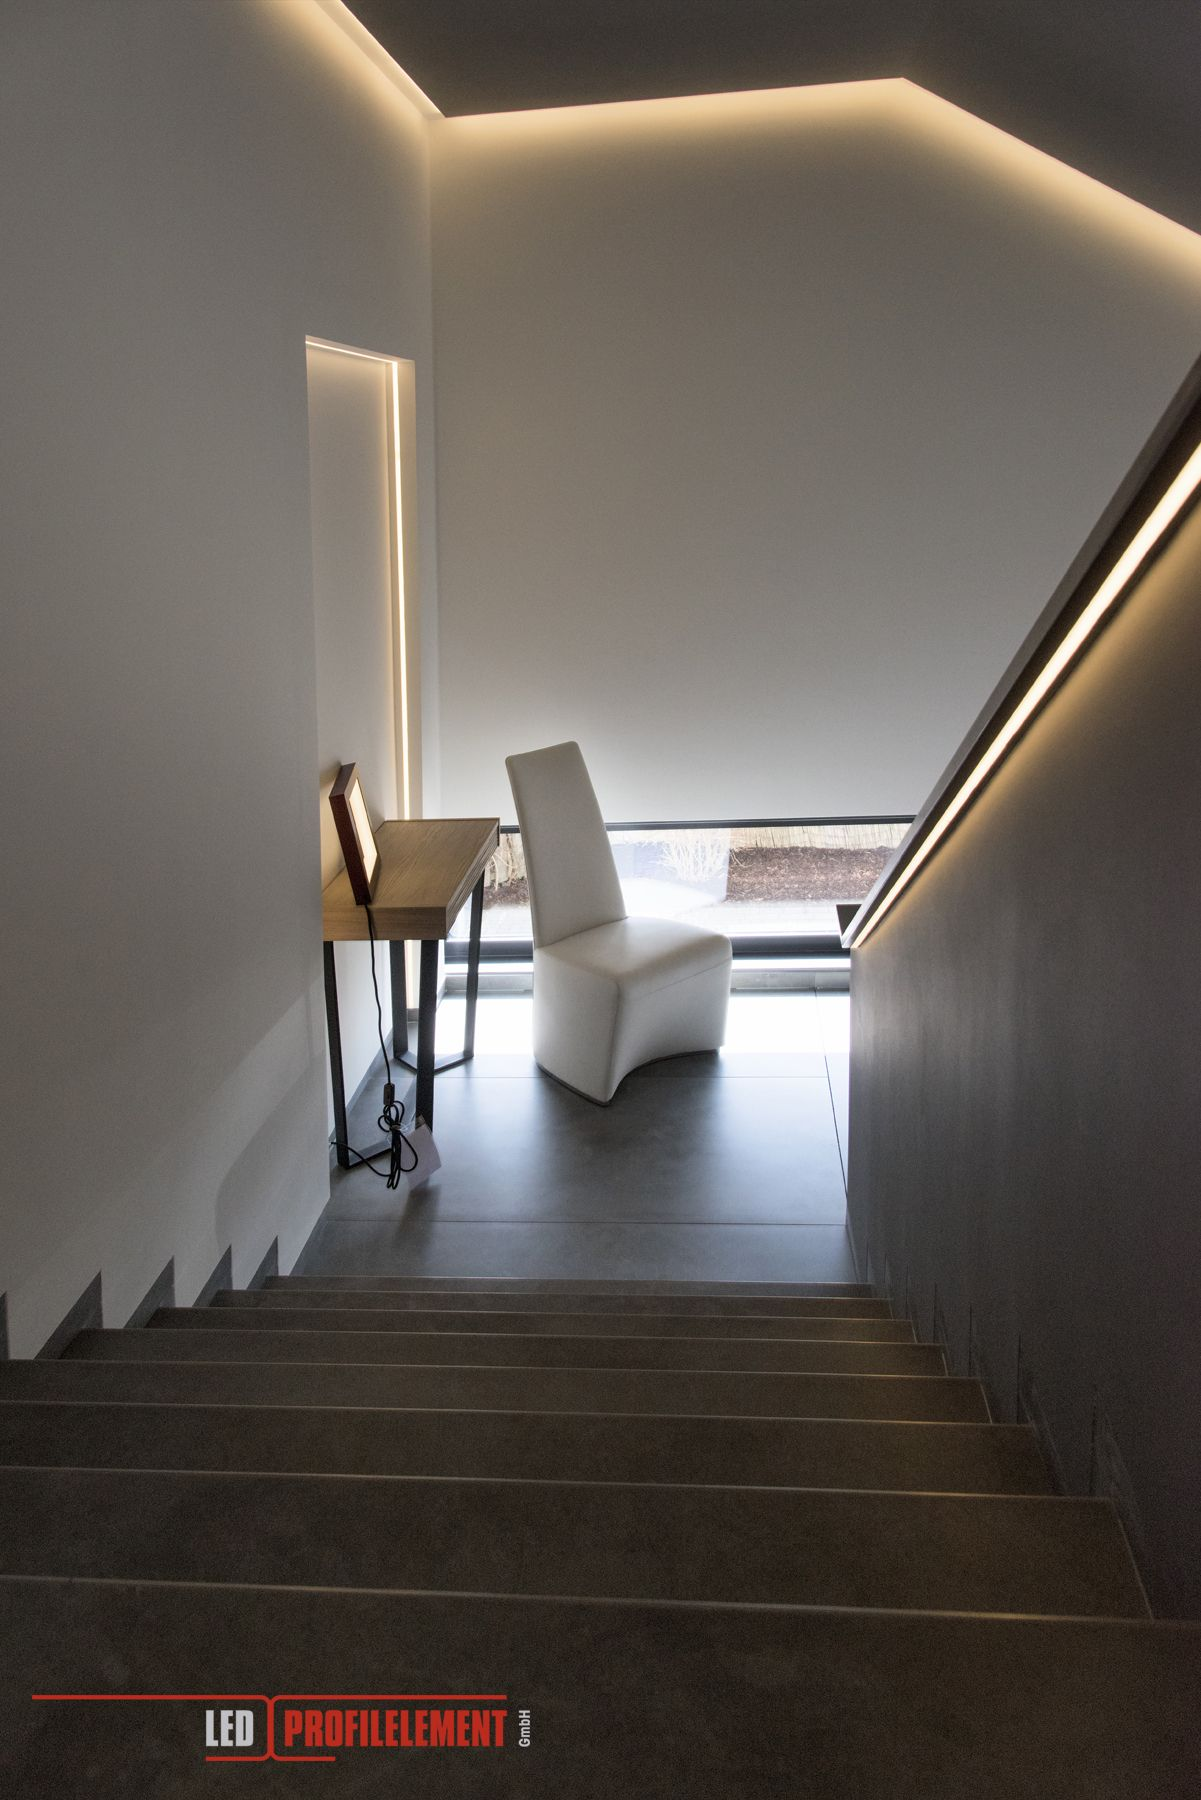 Indirekte Beleuchtung In Einem Grossen Treppenhaus Www Ledprofilelement De Beleuchtung Treppe Haus Indirekte Beleuchtung